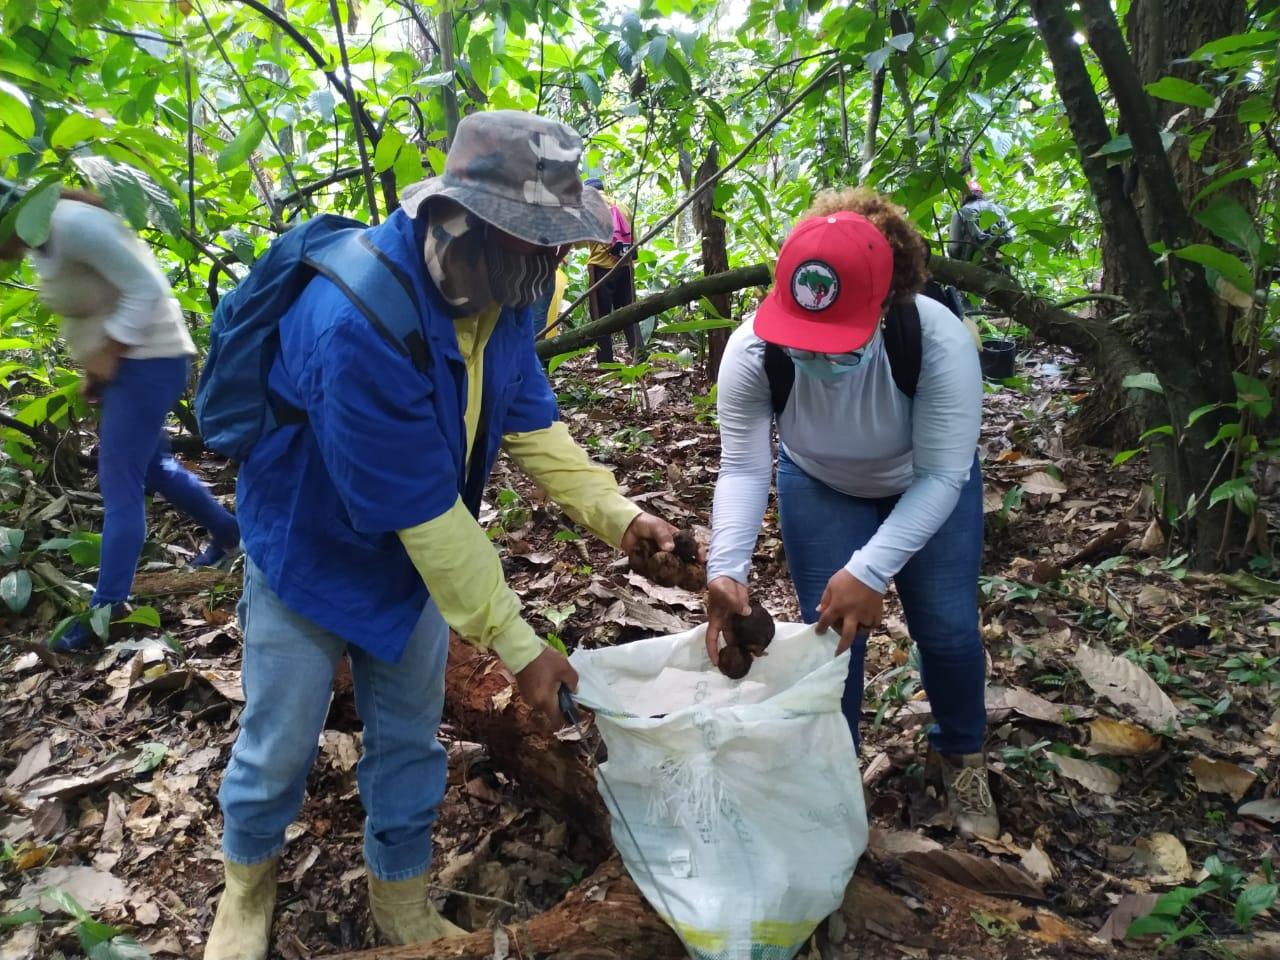 Sementes que geram vida: MST realiza coleta de sementes no Bioma Mata Atlântica